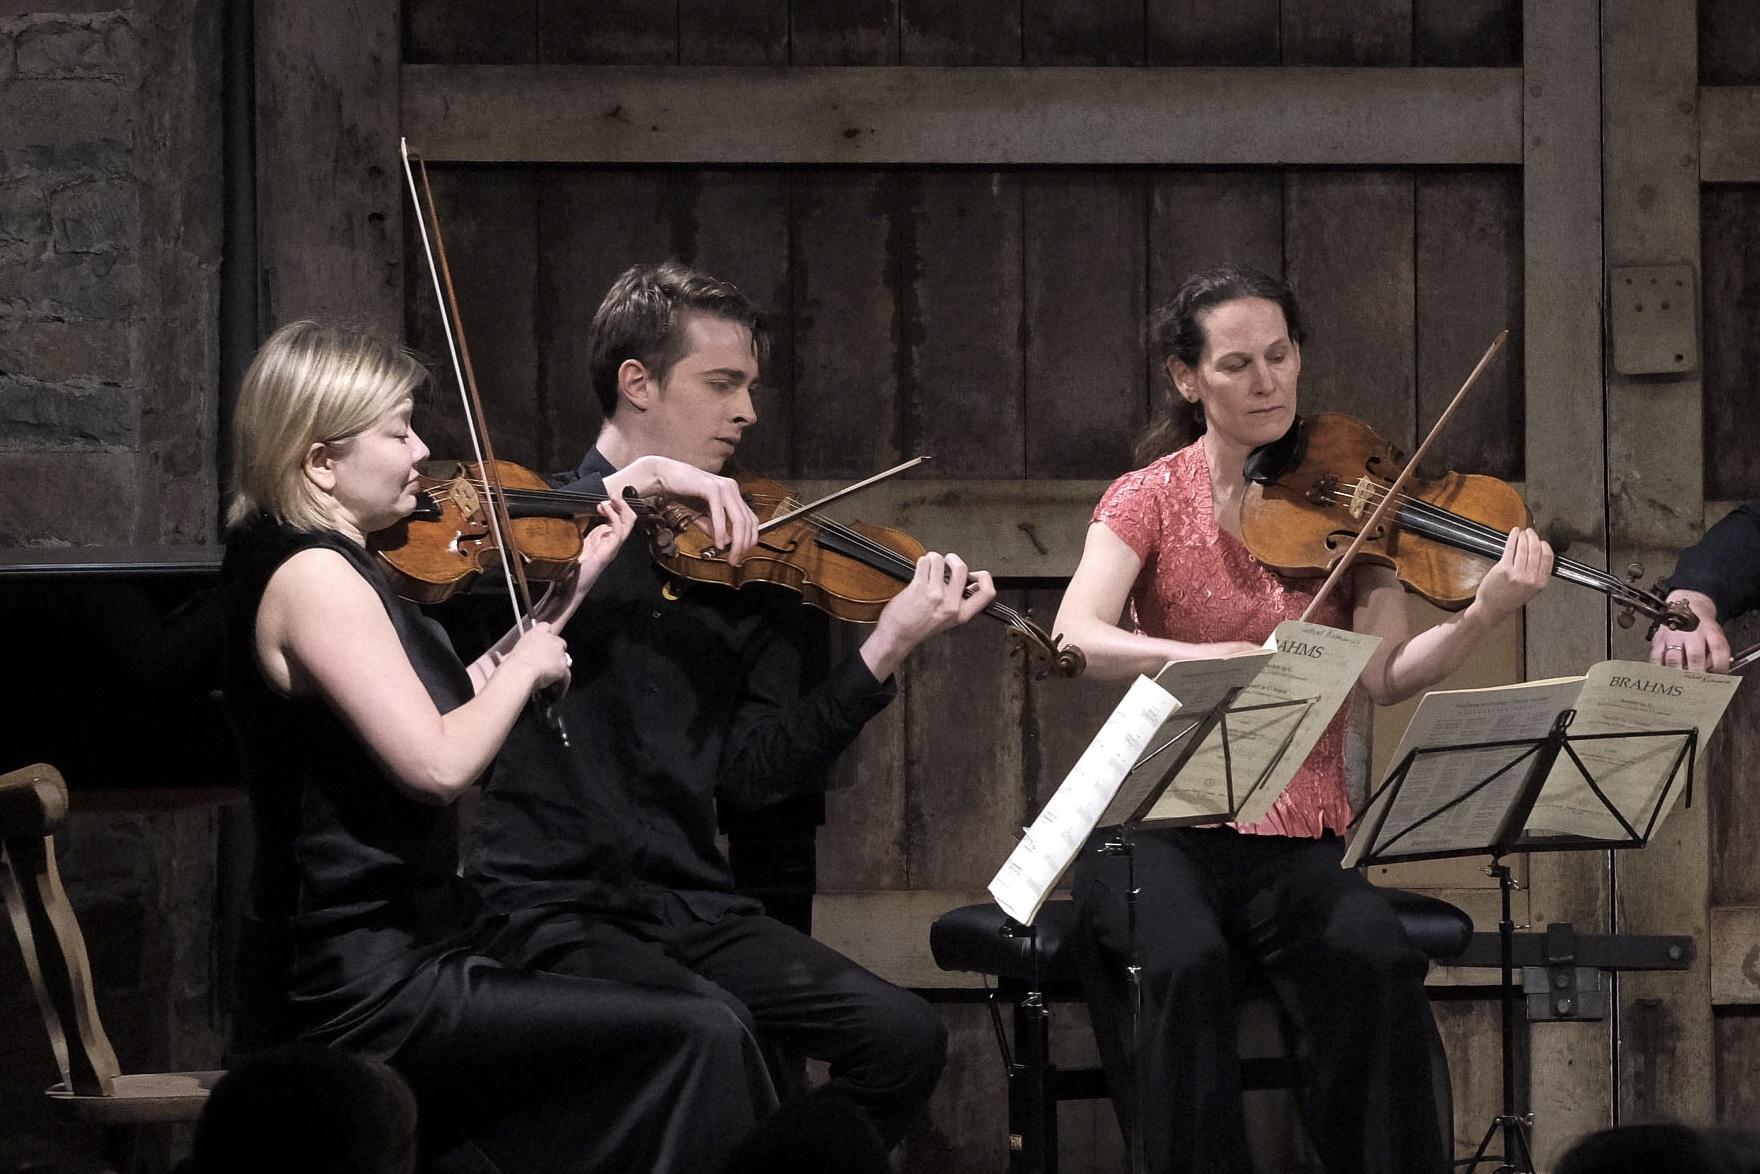 Alina Ibragimova, Tim Crawford (violons), Malin Broman (viola)